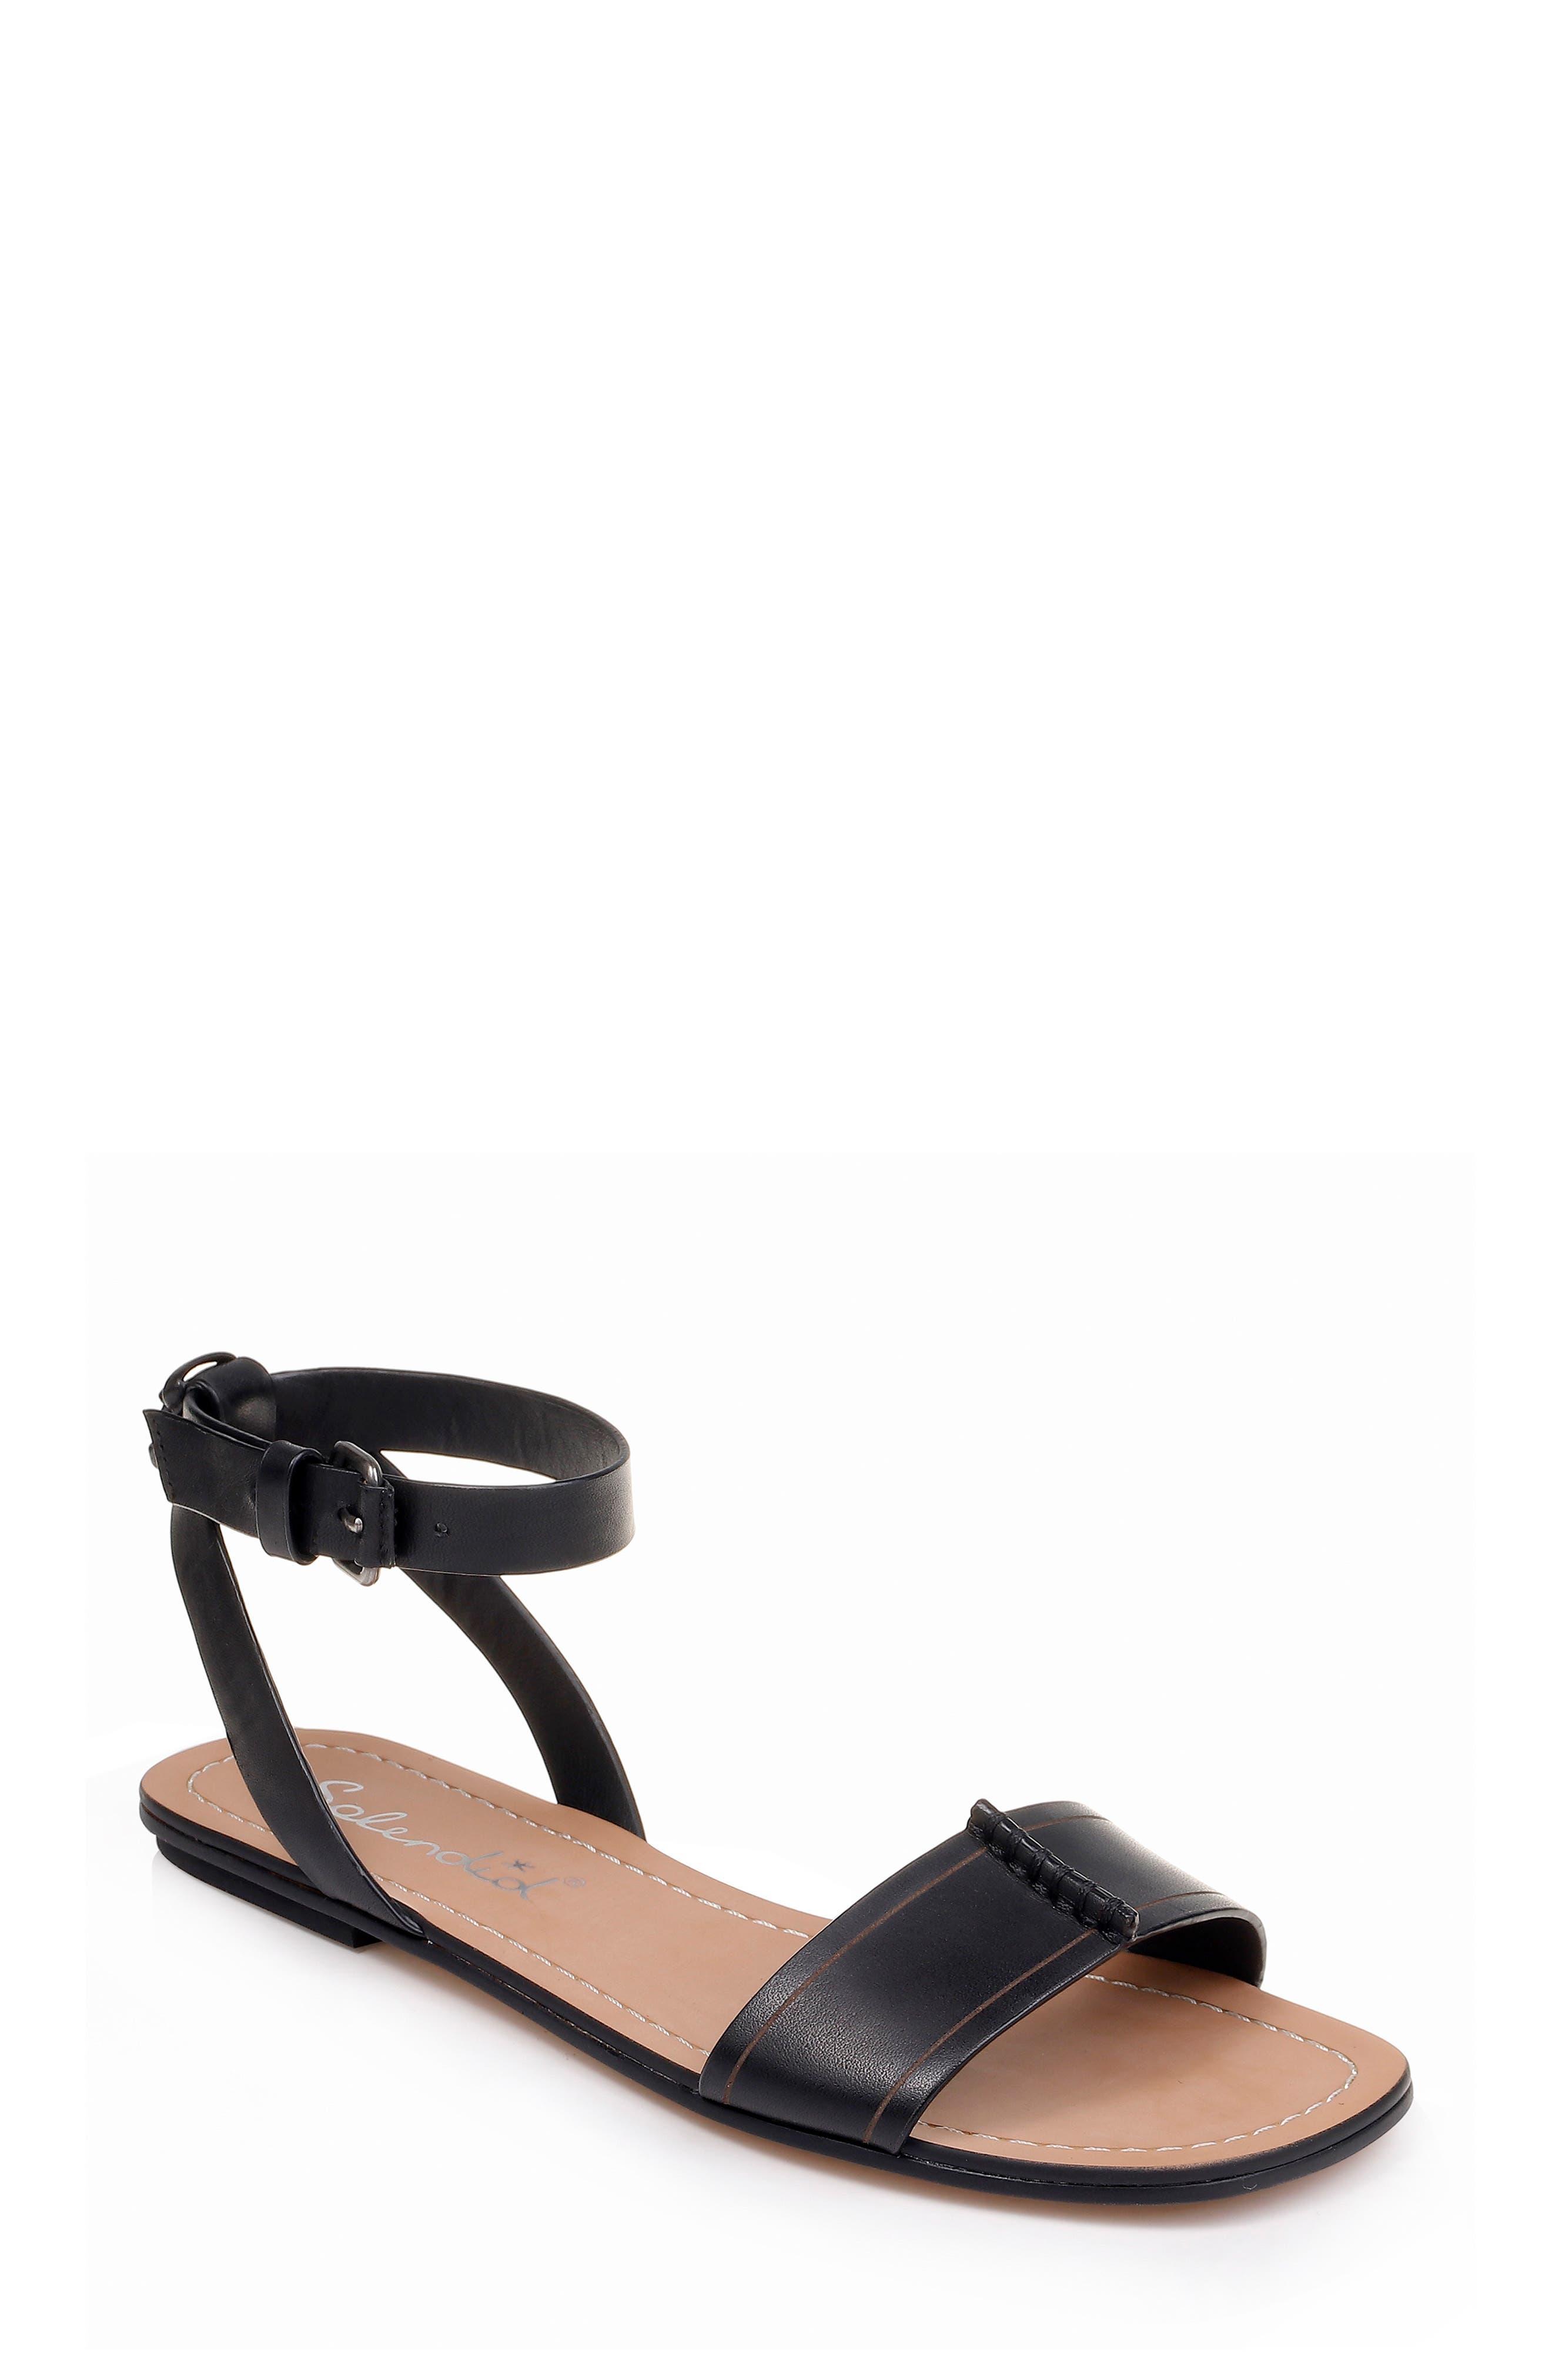 SPLENDID, Tabitha Ankle Strap Flat Sandal, Main thumbnail 1, color, BLACK LEATHER